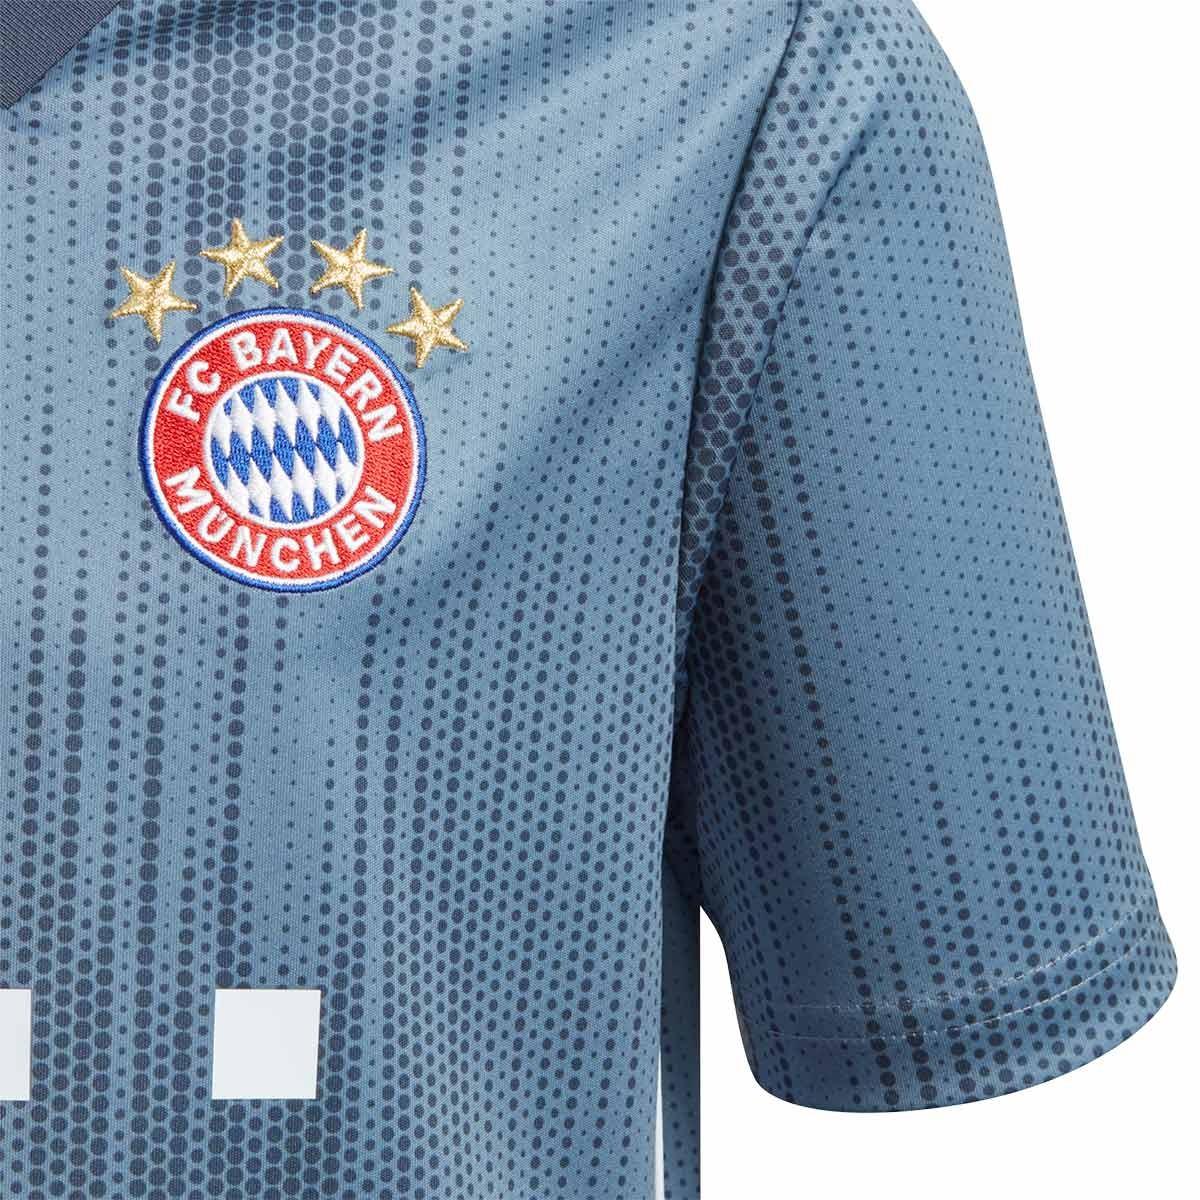 info for 11a5a 65770 Camiseta FC Bayern Munich Tercera Equipación 2018-2019 Niño Raw  steel-Utility blue-White